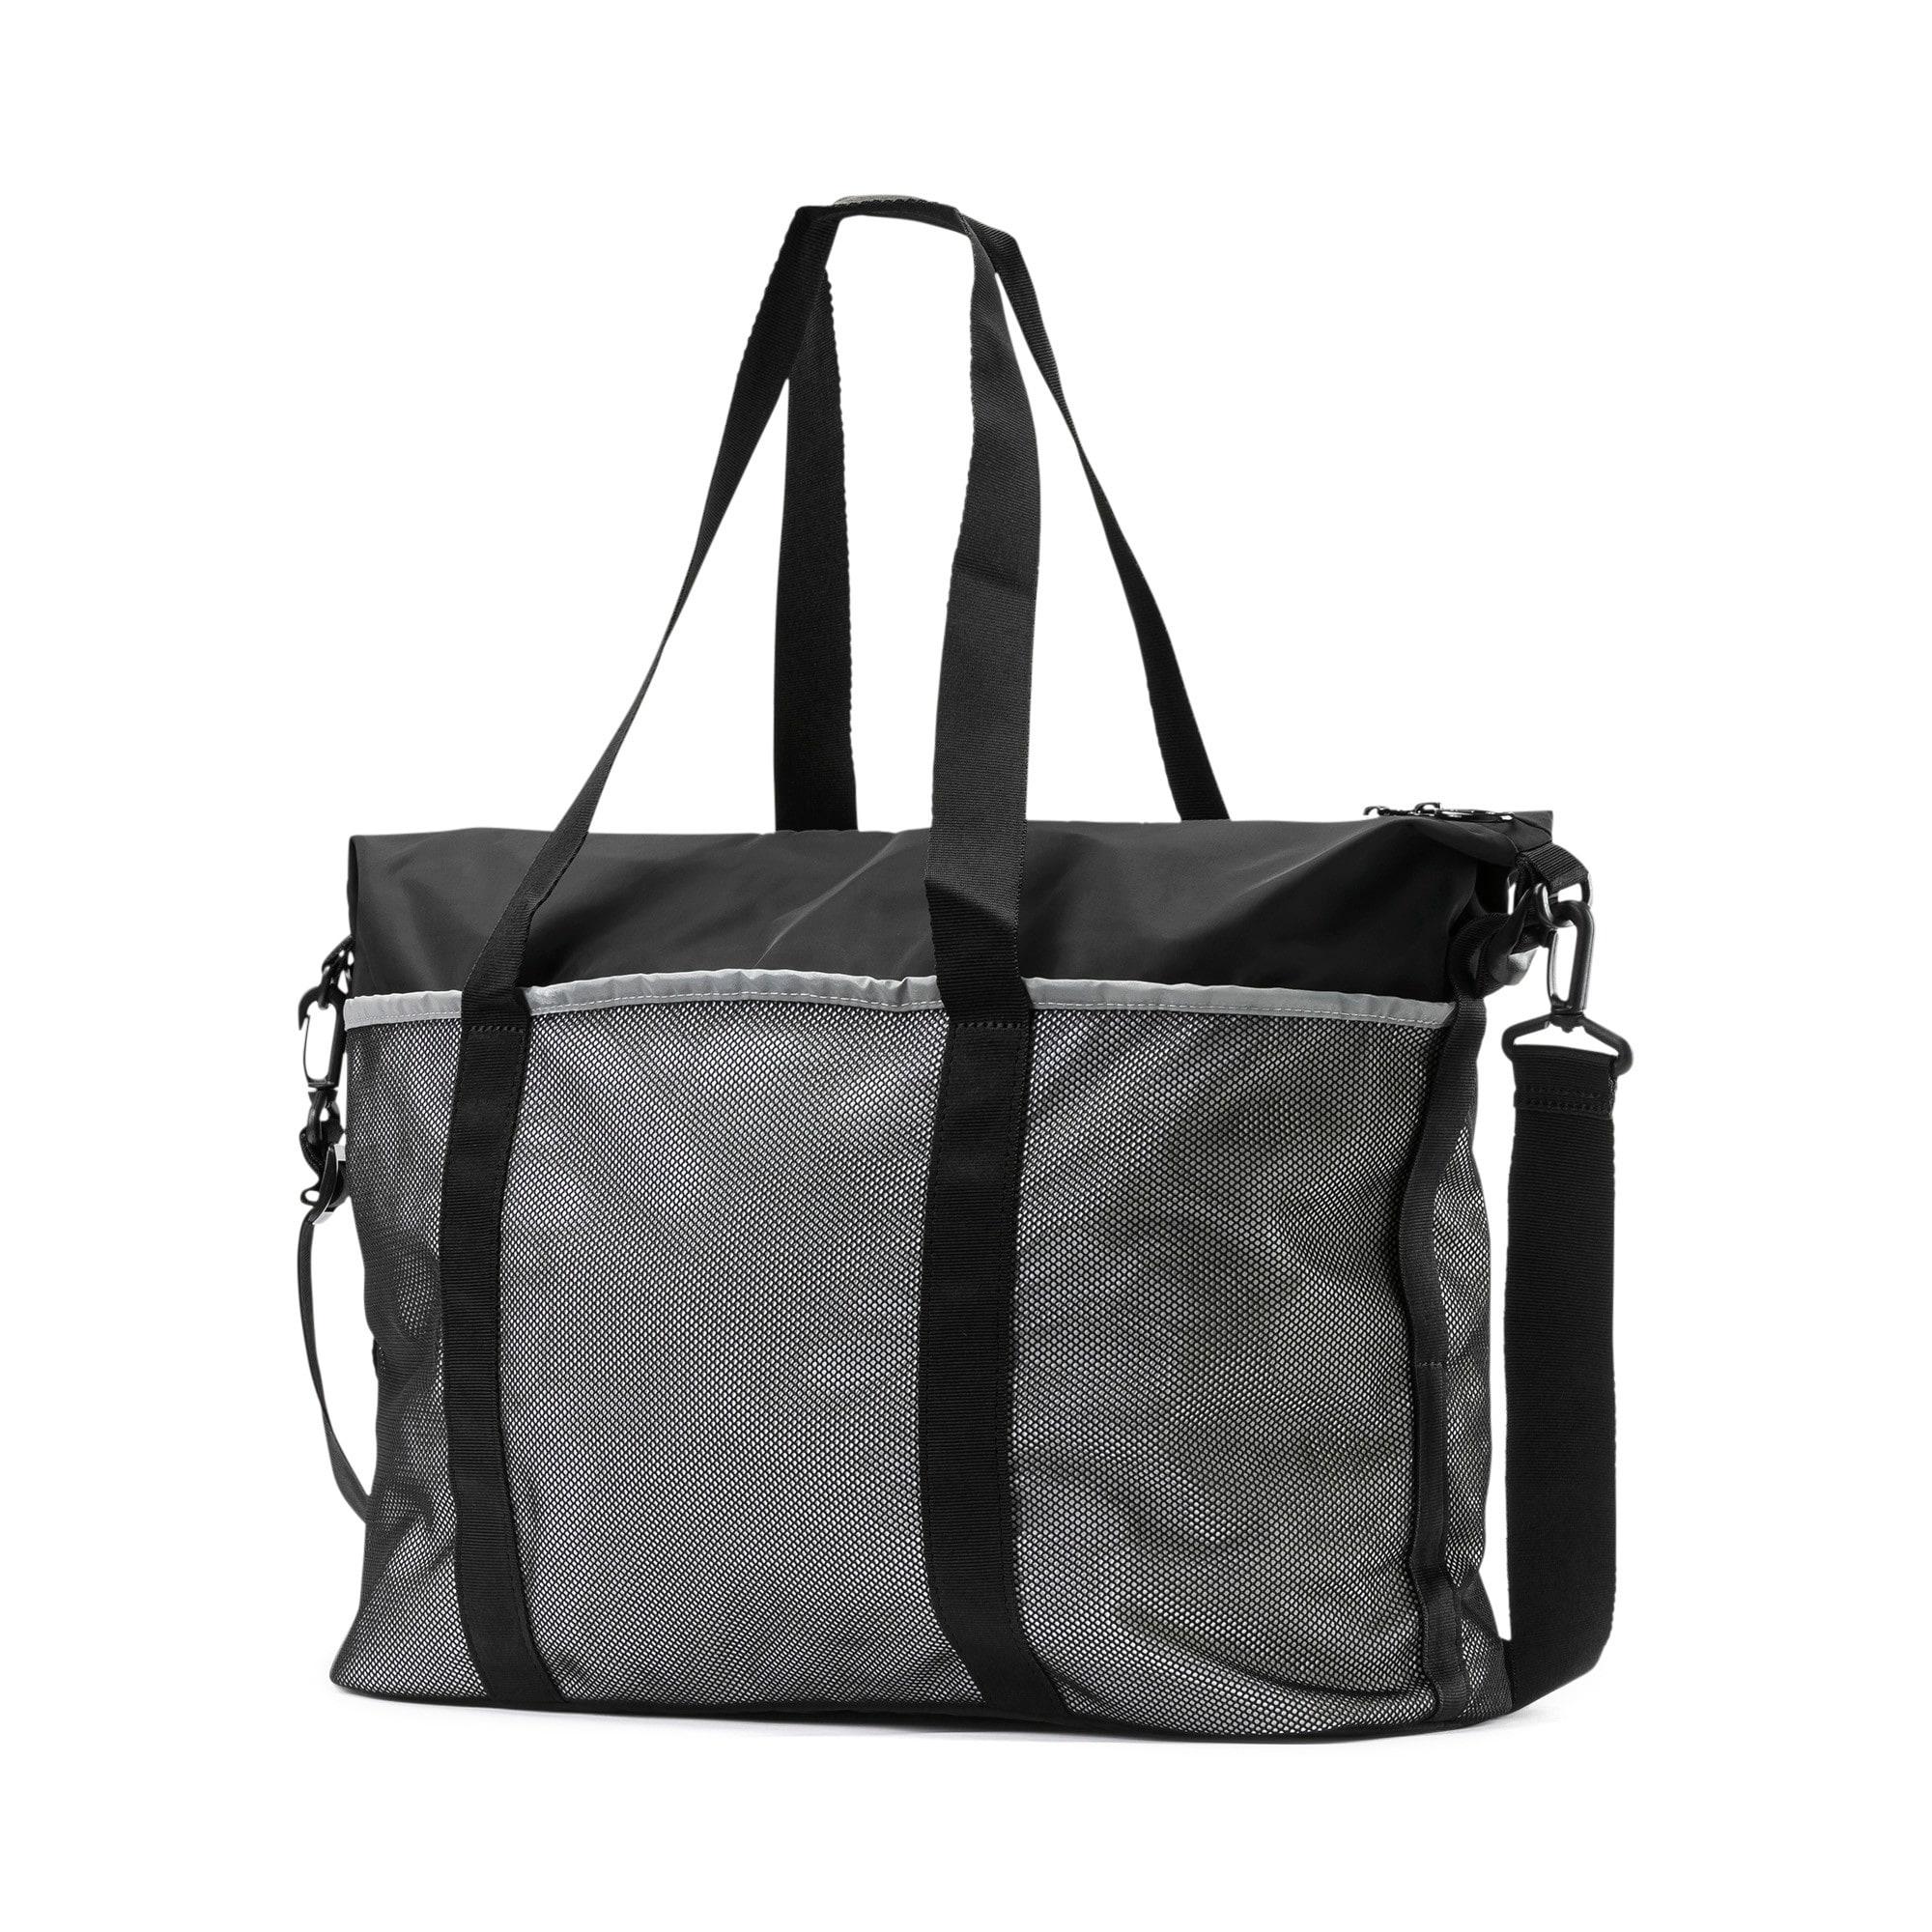 Thumbnail 3 of PUMA x SELENA GOMEZ Women's Sport Duffle Bag, Puma Black, medium